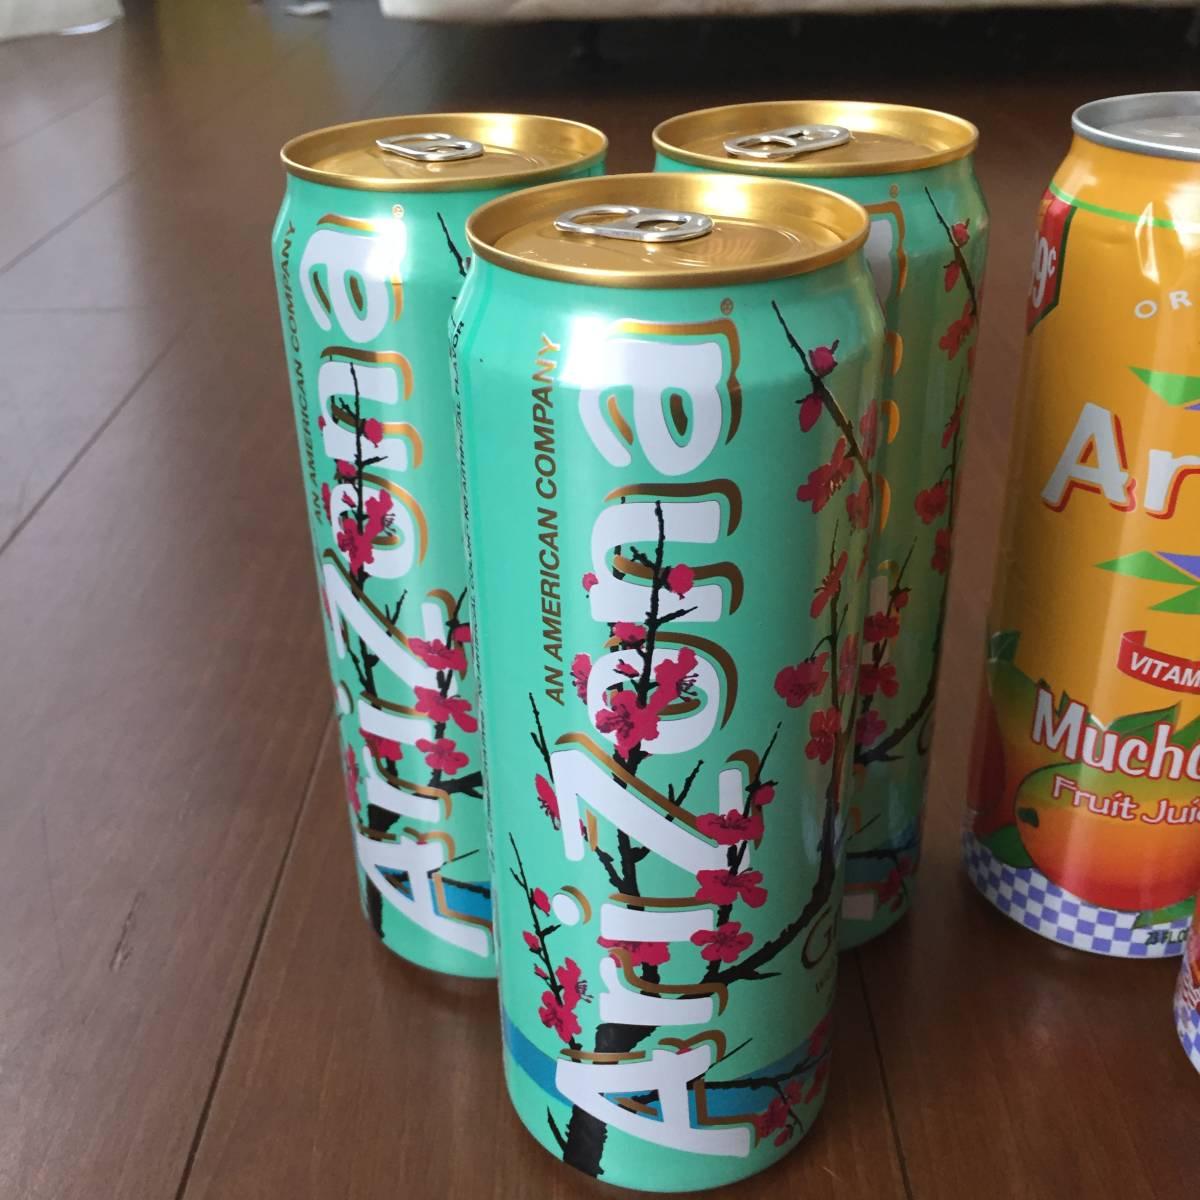 ARIZONA GREEN TEA GINSENG HONEY アリゾナ グリーン ティー ハワイ アメリカ 日本未発売 日本未入荷 海外限定 緑茶 レモンティ 680ml_画像2